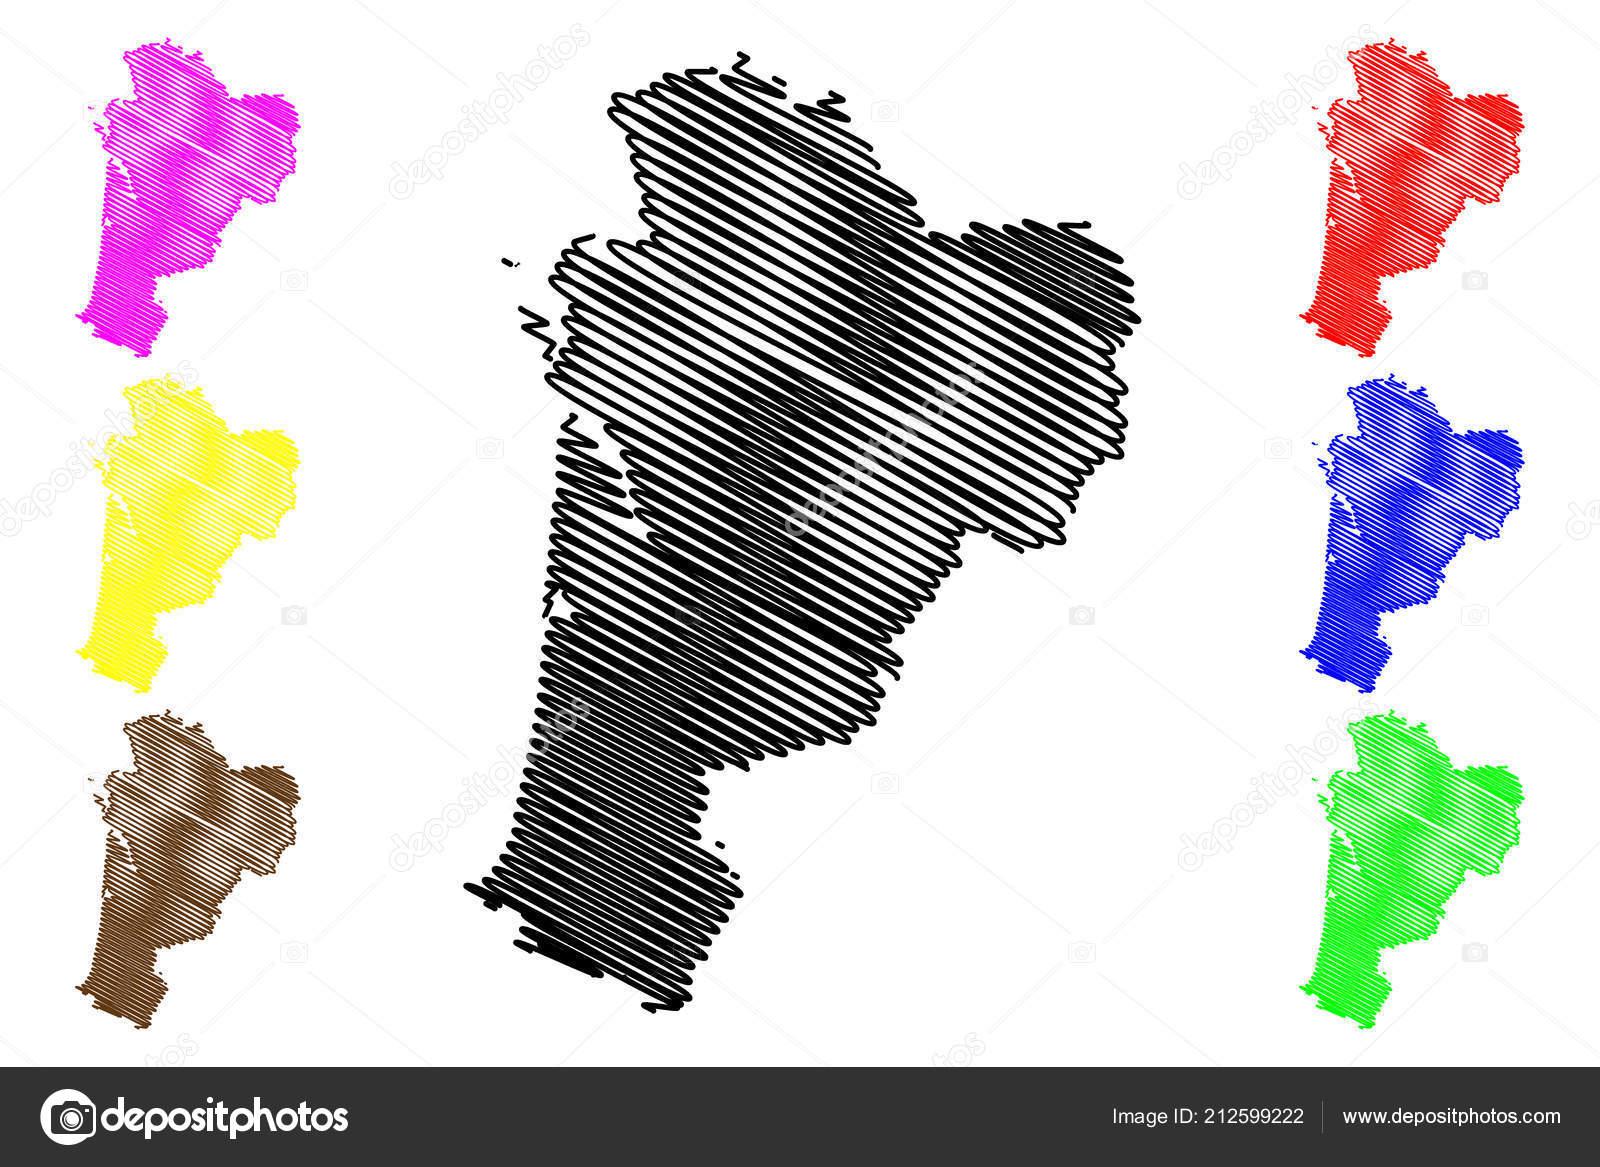 Nouvelle Aquitaine France Administrative Region Map Vector